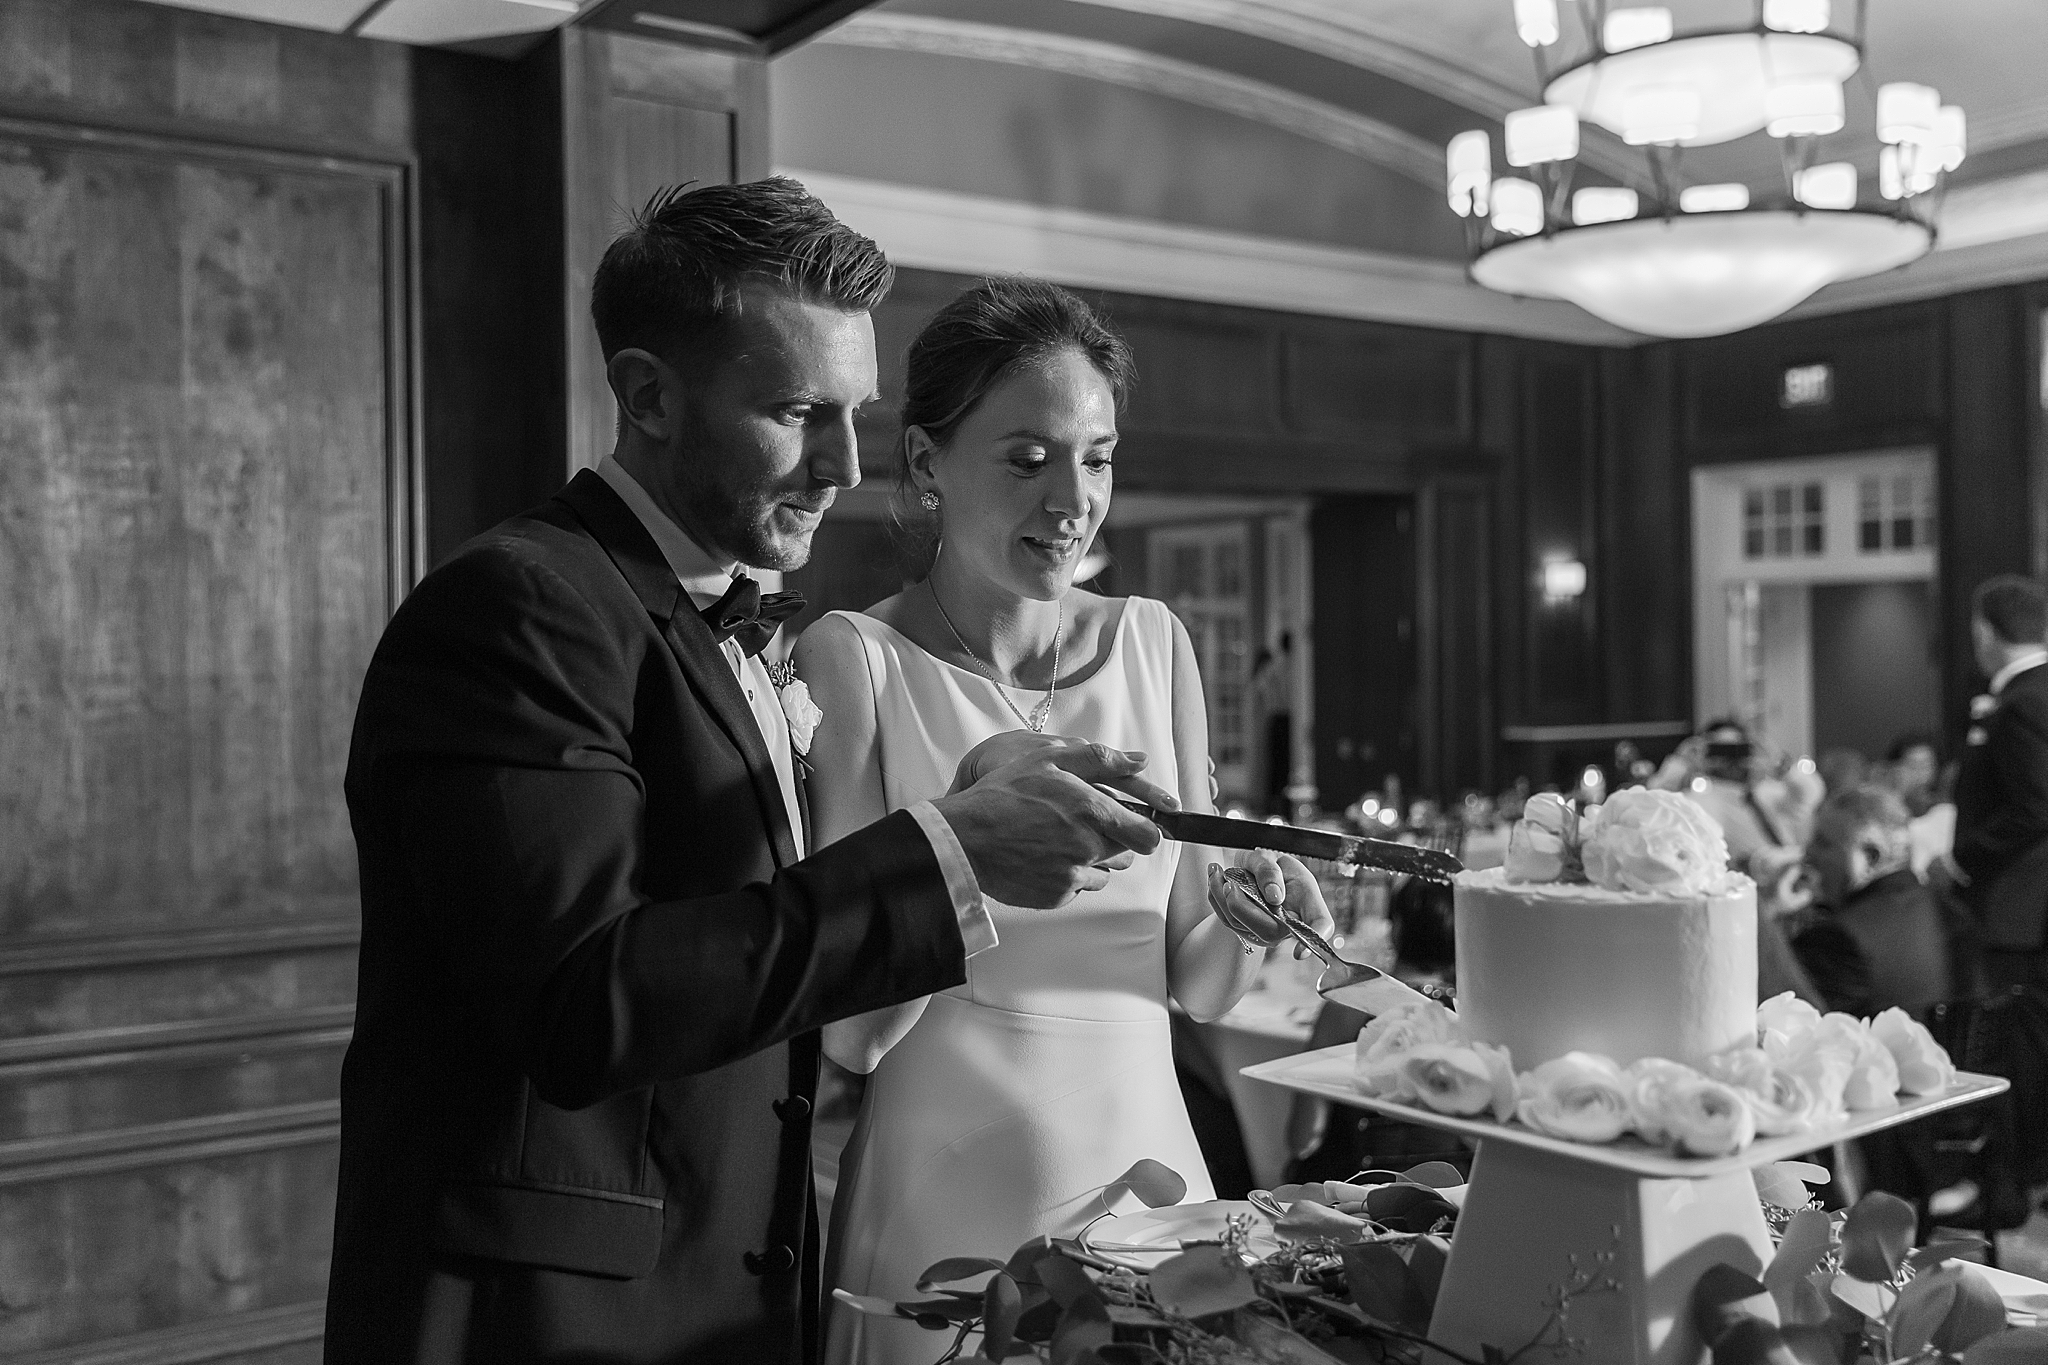 detroit-wedding-photographer-grosse-pointe-academy-chapel-detroit-golf-club-wedding-carly-matt-by-courtney-carolyn-photography_0125.jpg